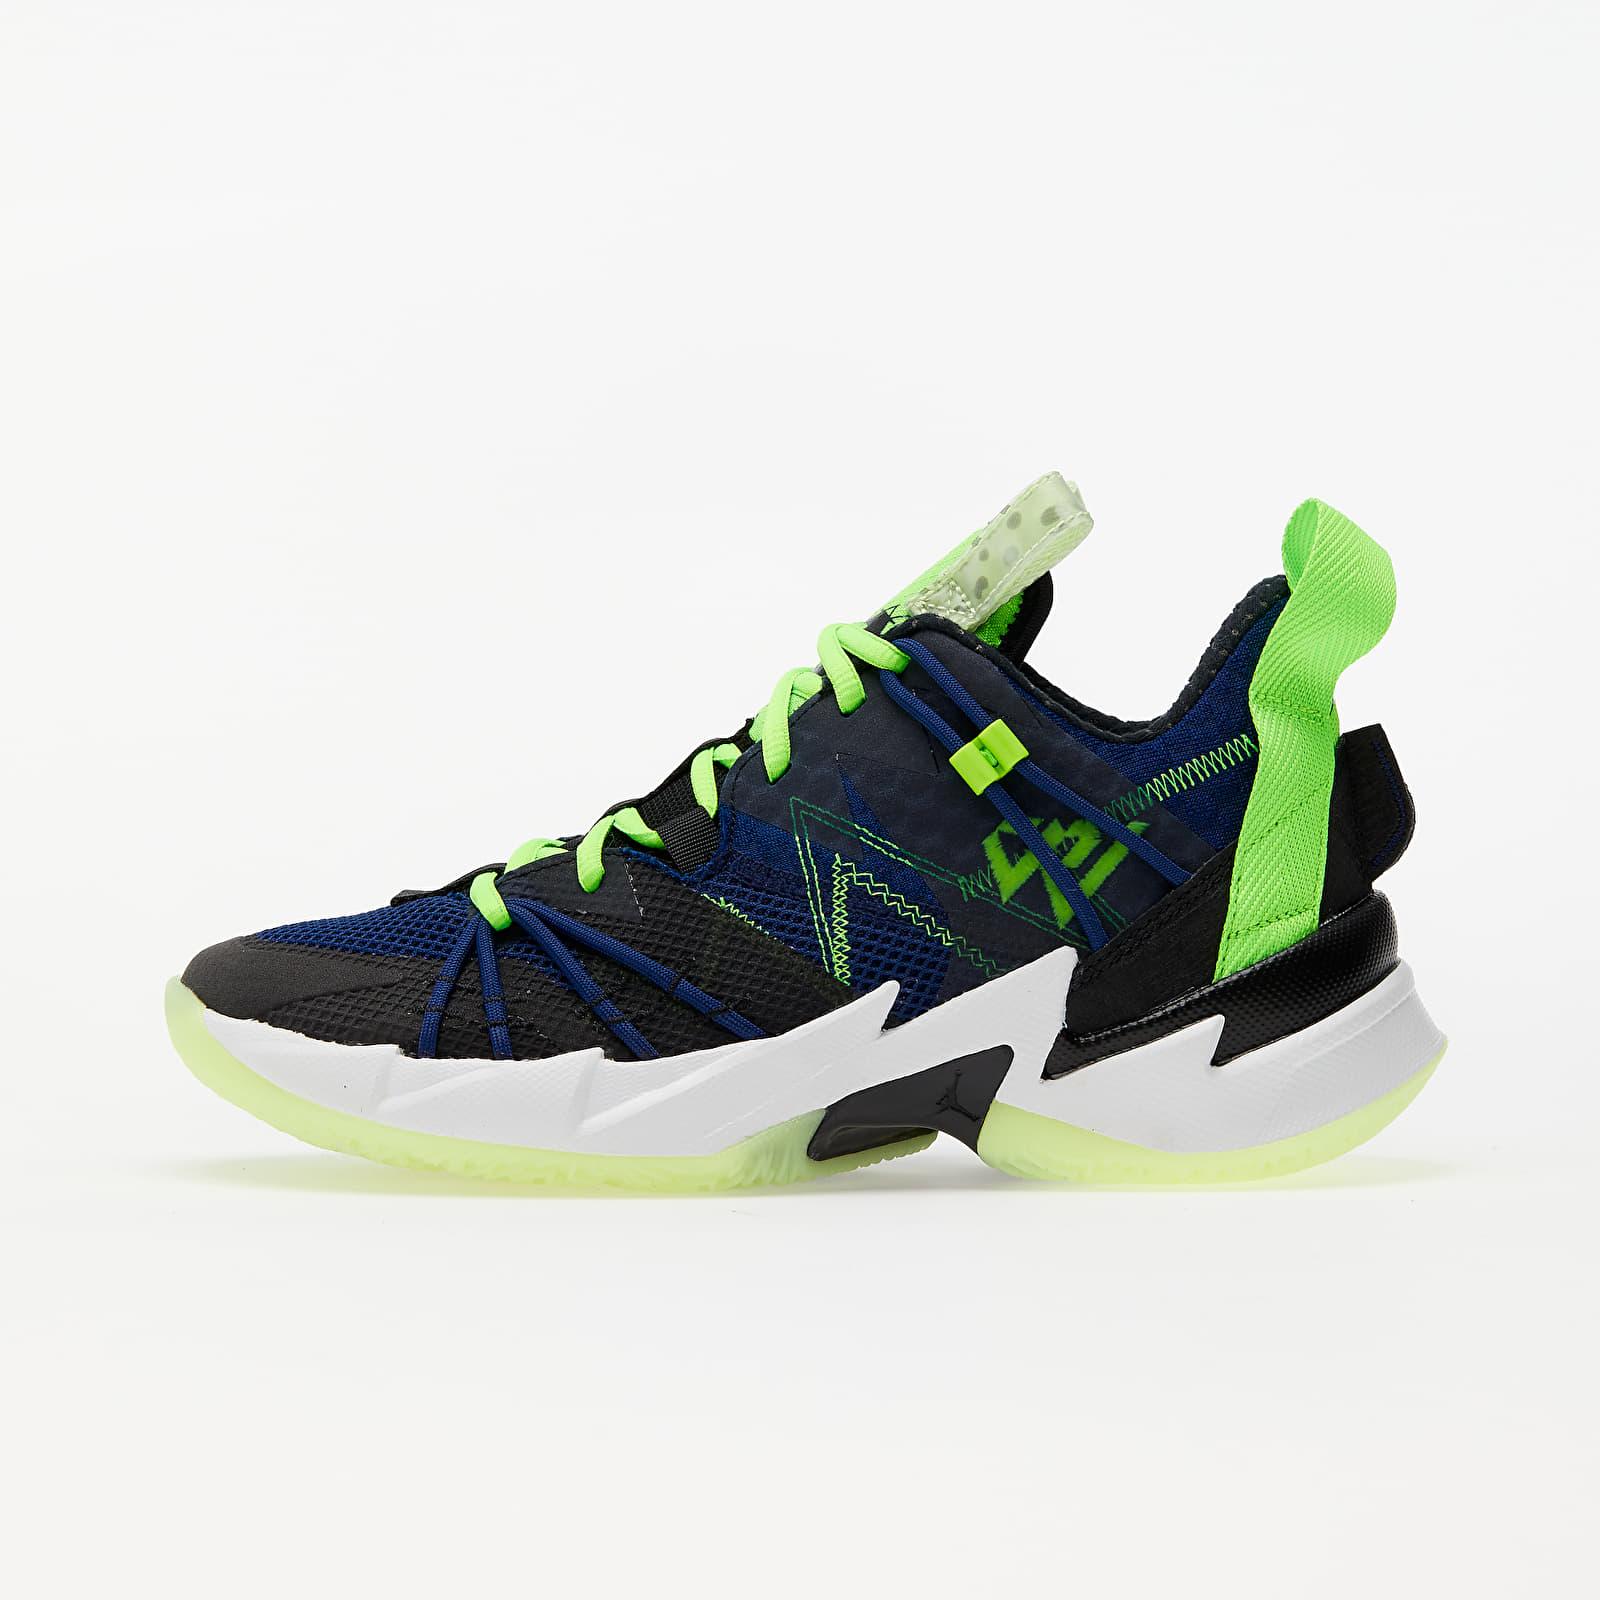 Jordan Why Not Zer0.3 SE Black/ Key Lime-Blue Void-Summit White EUR 44